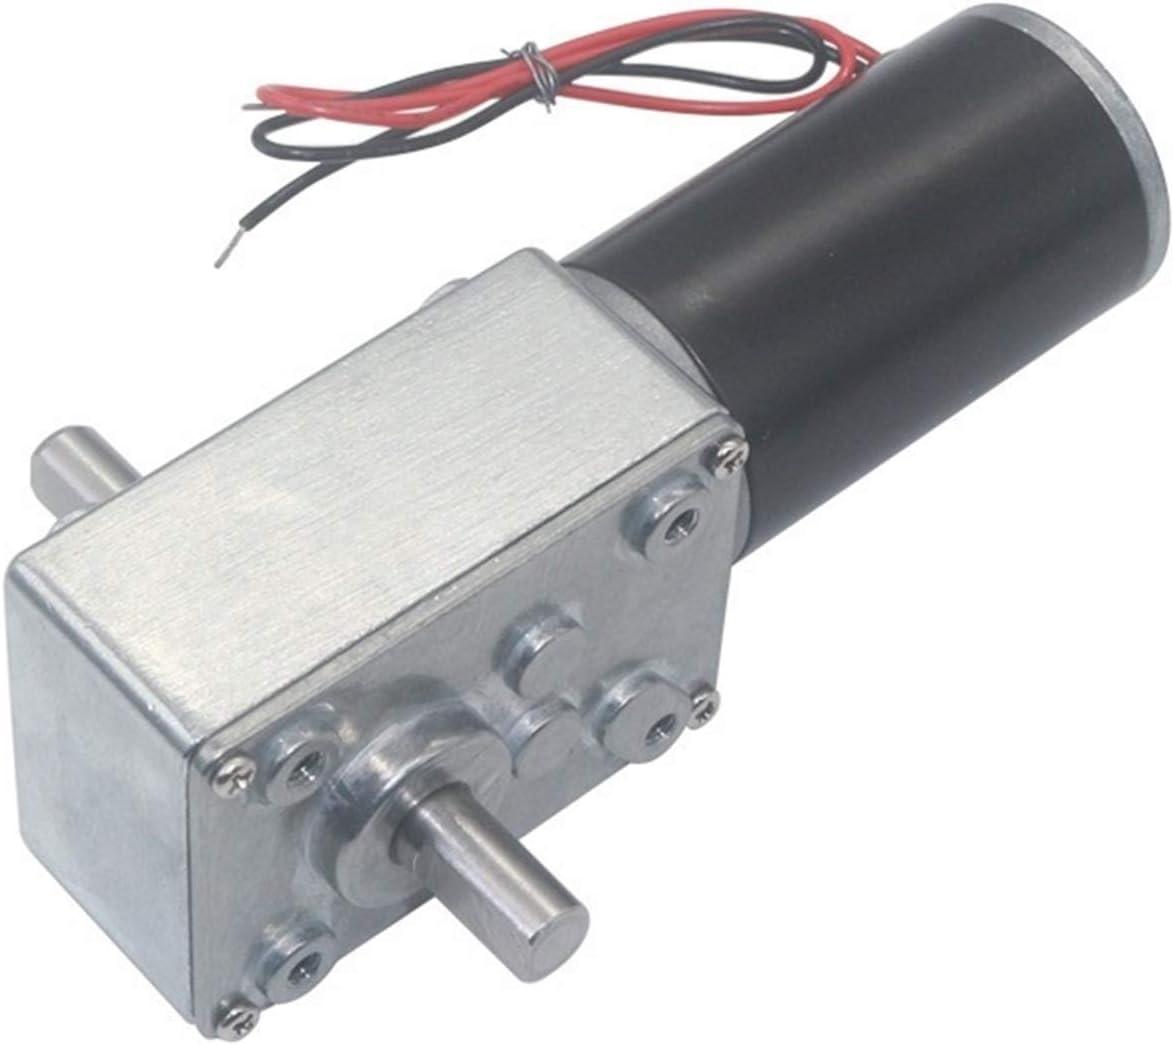 Jjzhb PYunLi-Motor de Corriente Continua Motor de Alta voltio de 24 voltios, 5840-31ZY Motor DE Mayor DE Mayor DE LODING DE Eje Doble Eje, Piezas Speed(RPM) : 5rpm, Voltage(V) : 12V